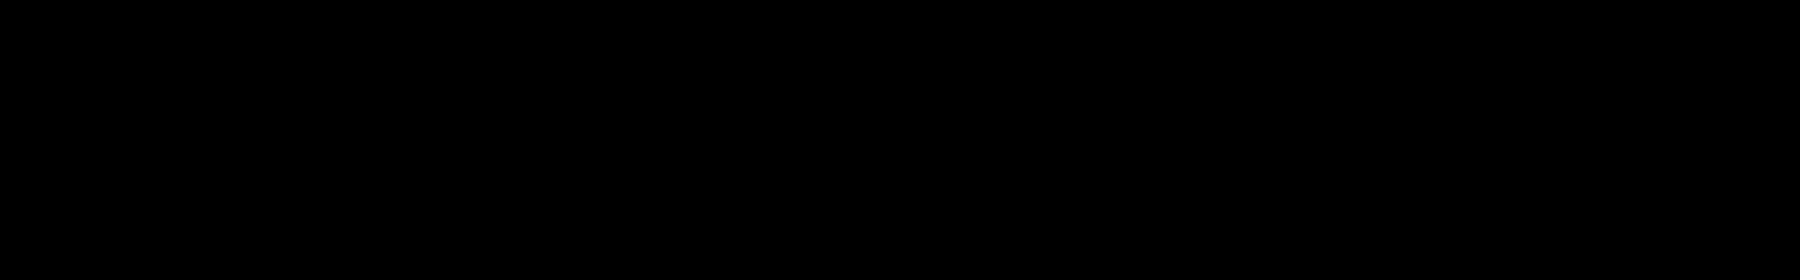 Lazer Kissed EDM Anthems audio waveform